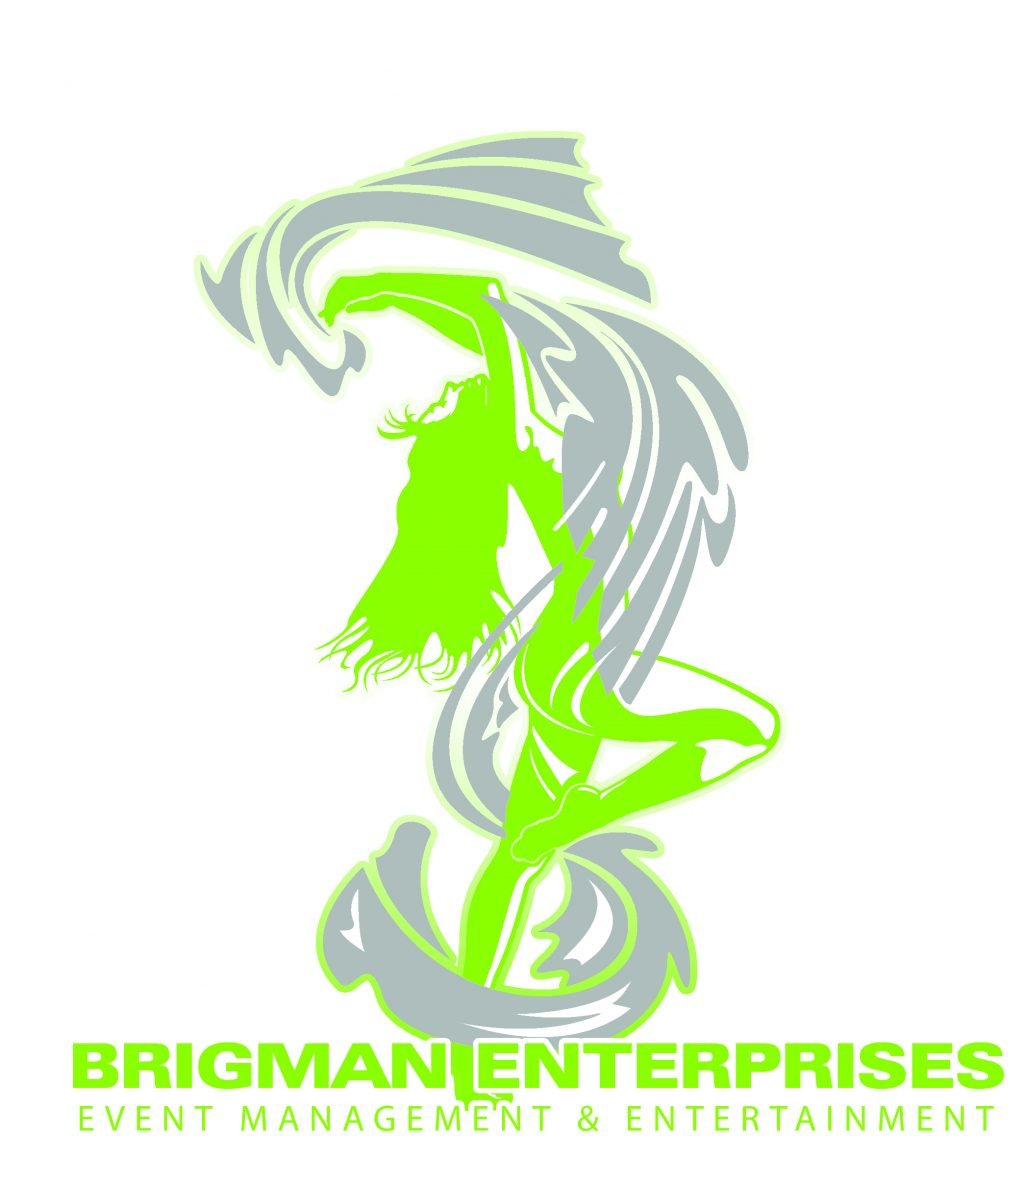 Brigman Enterprises.jpg